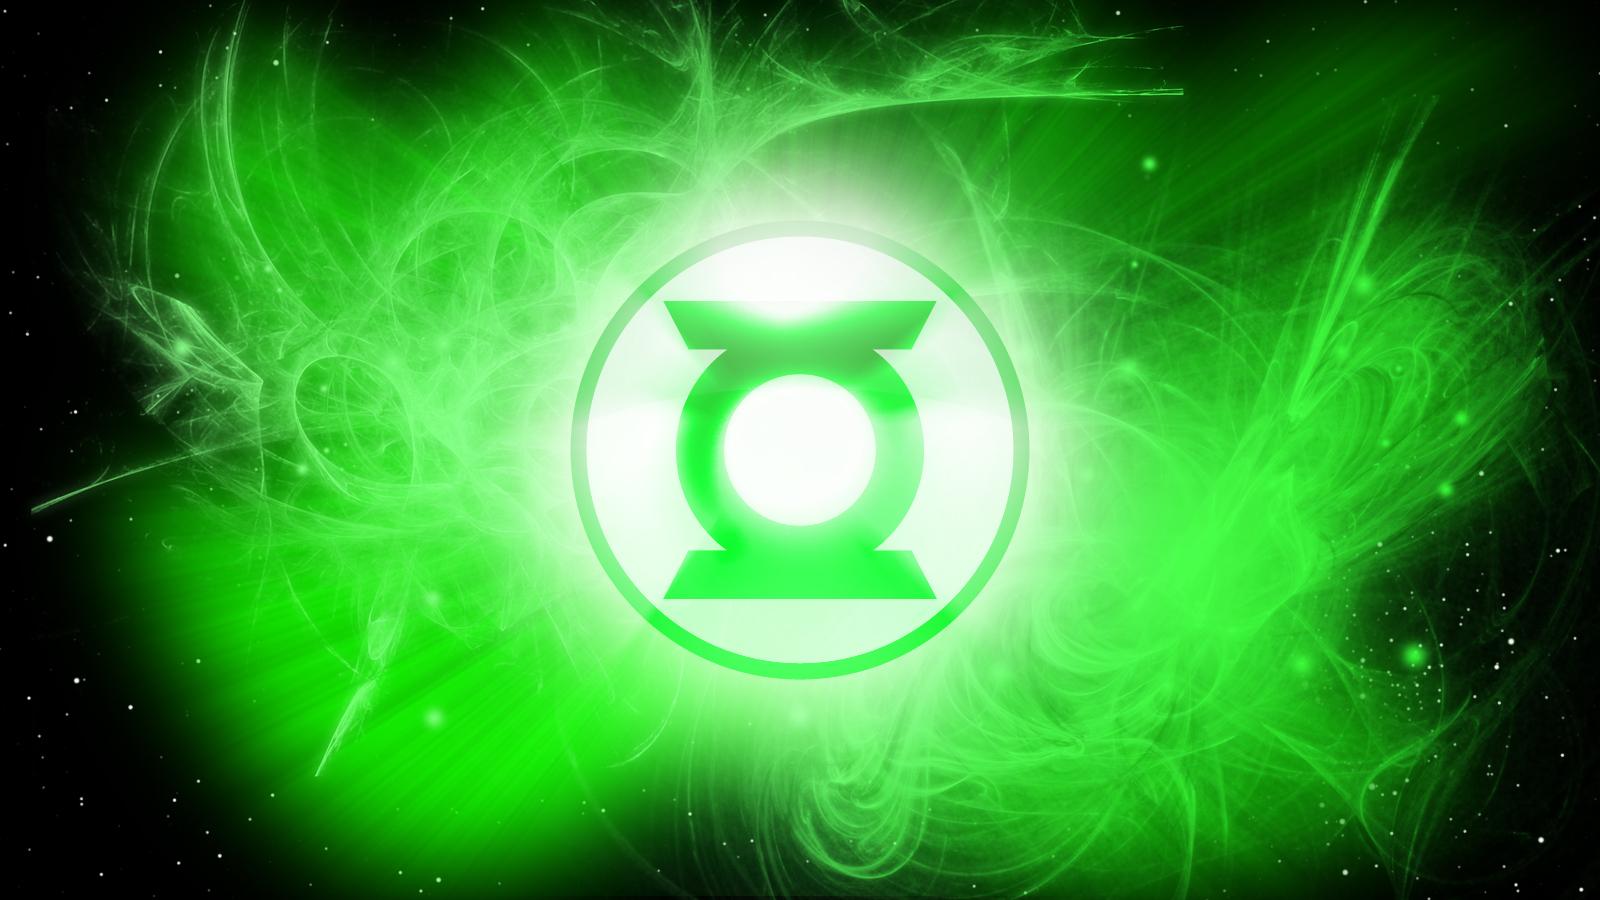 Tami Holman: Green Lantern Wallpaper Hd